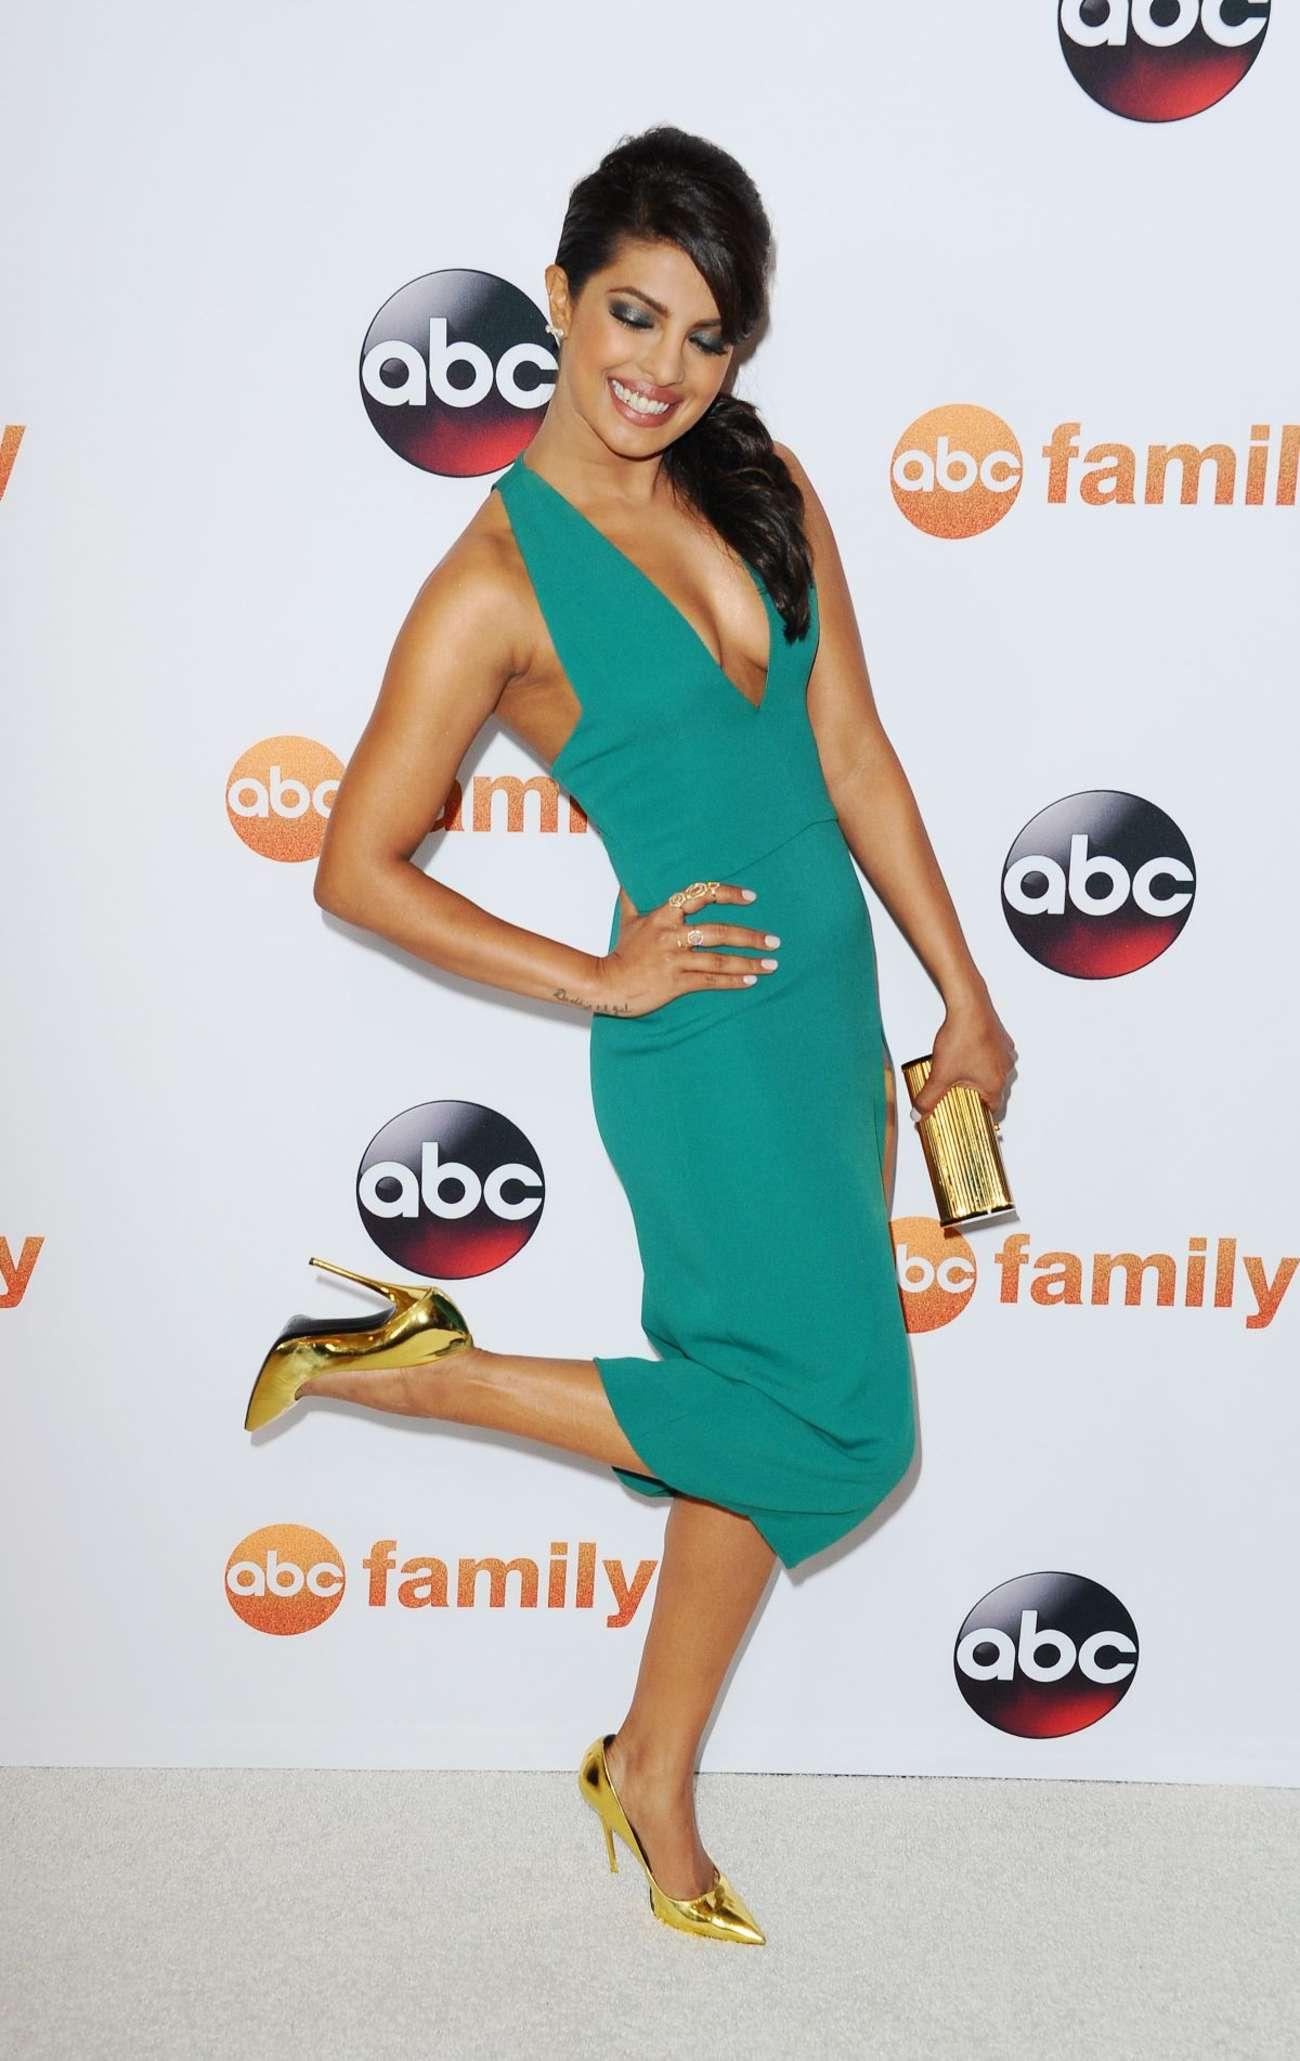 Priyanka Chopra - Disney ABC 2015 Summer TCA Press Tour Photo Call in Beverly Hills